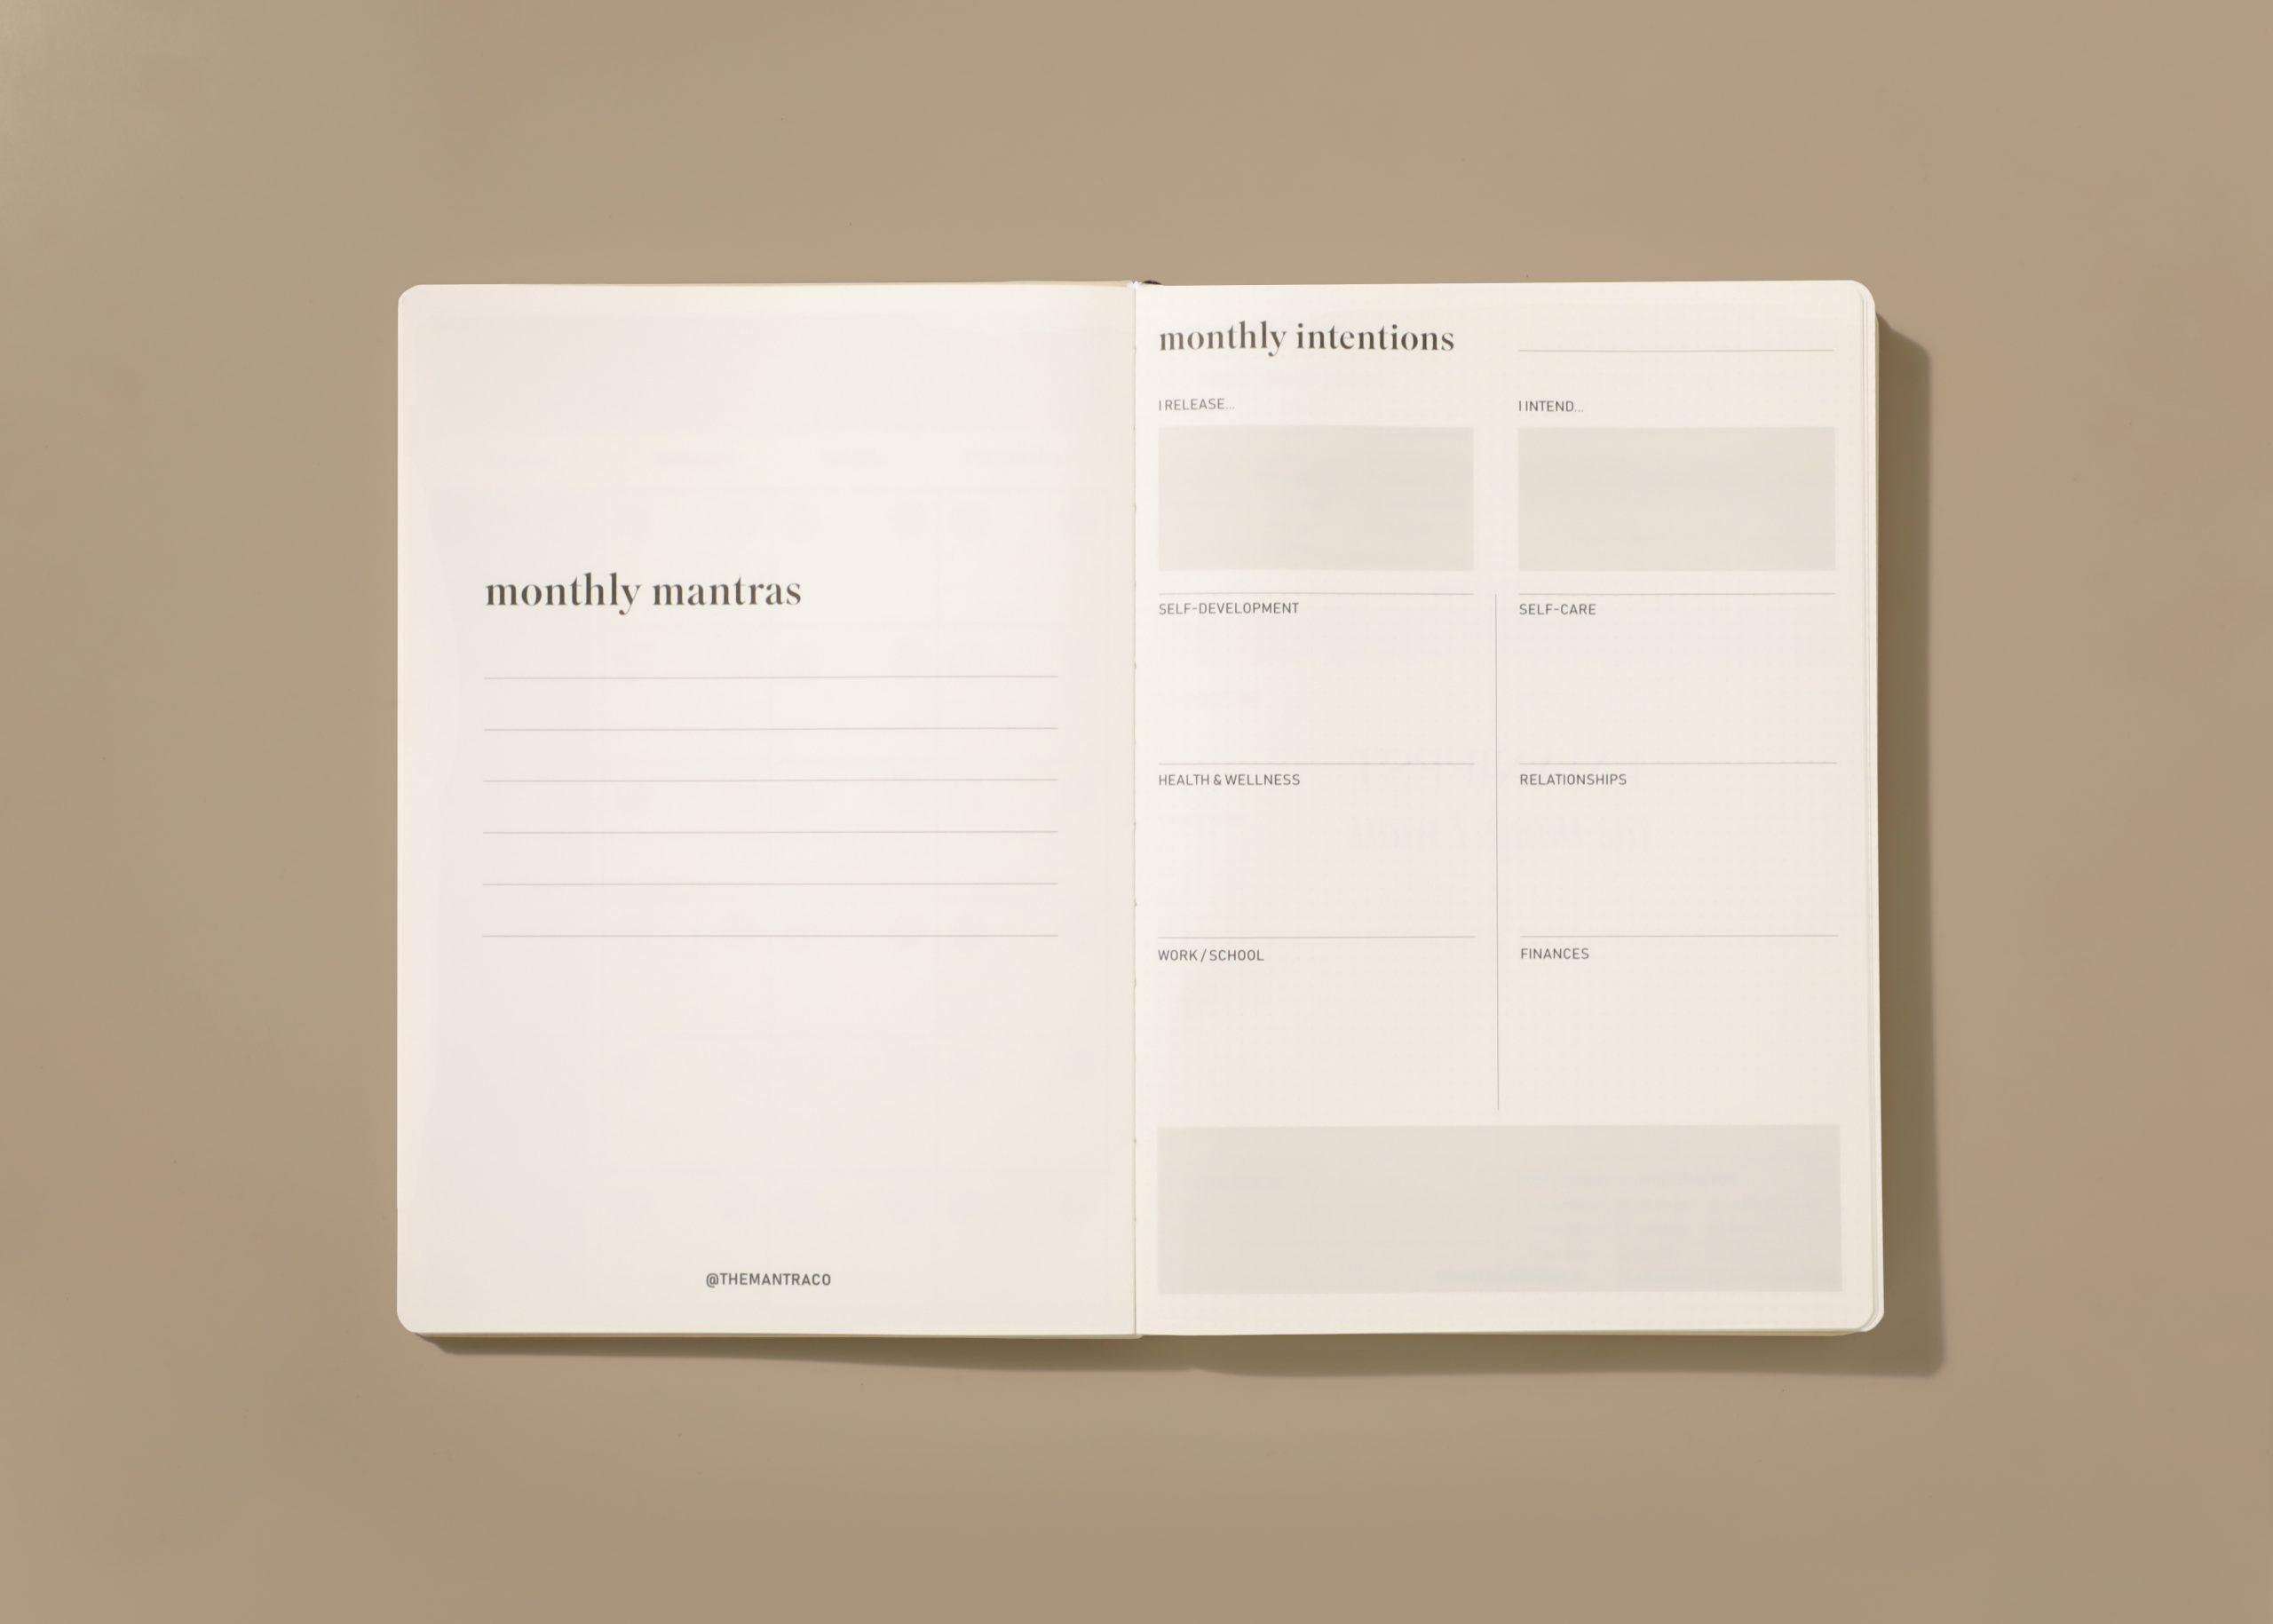 monthly-mantra-bg copy